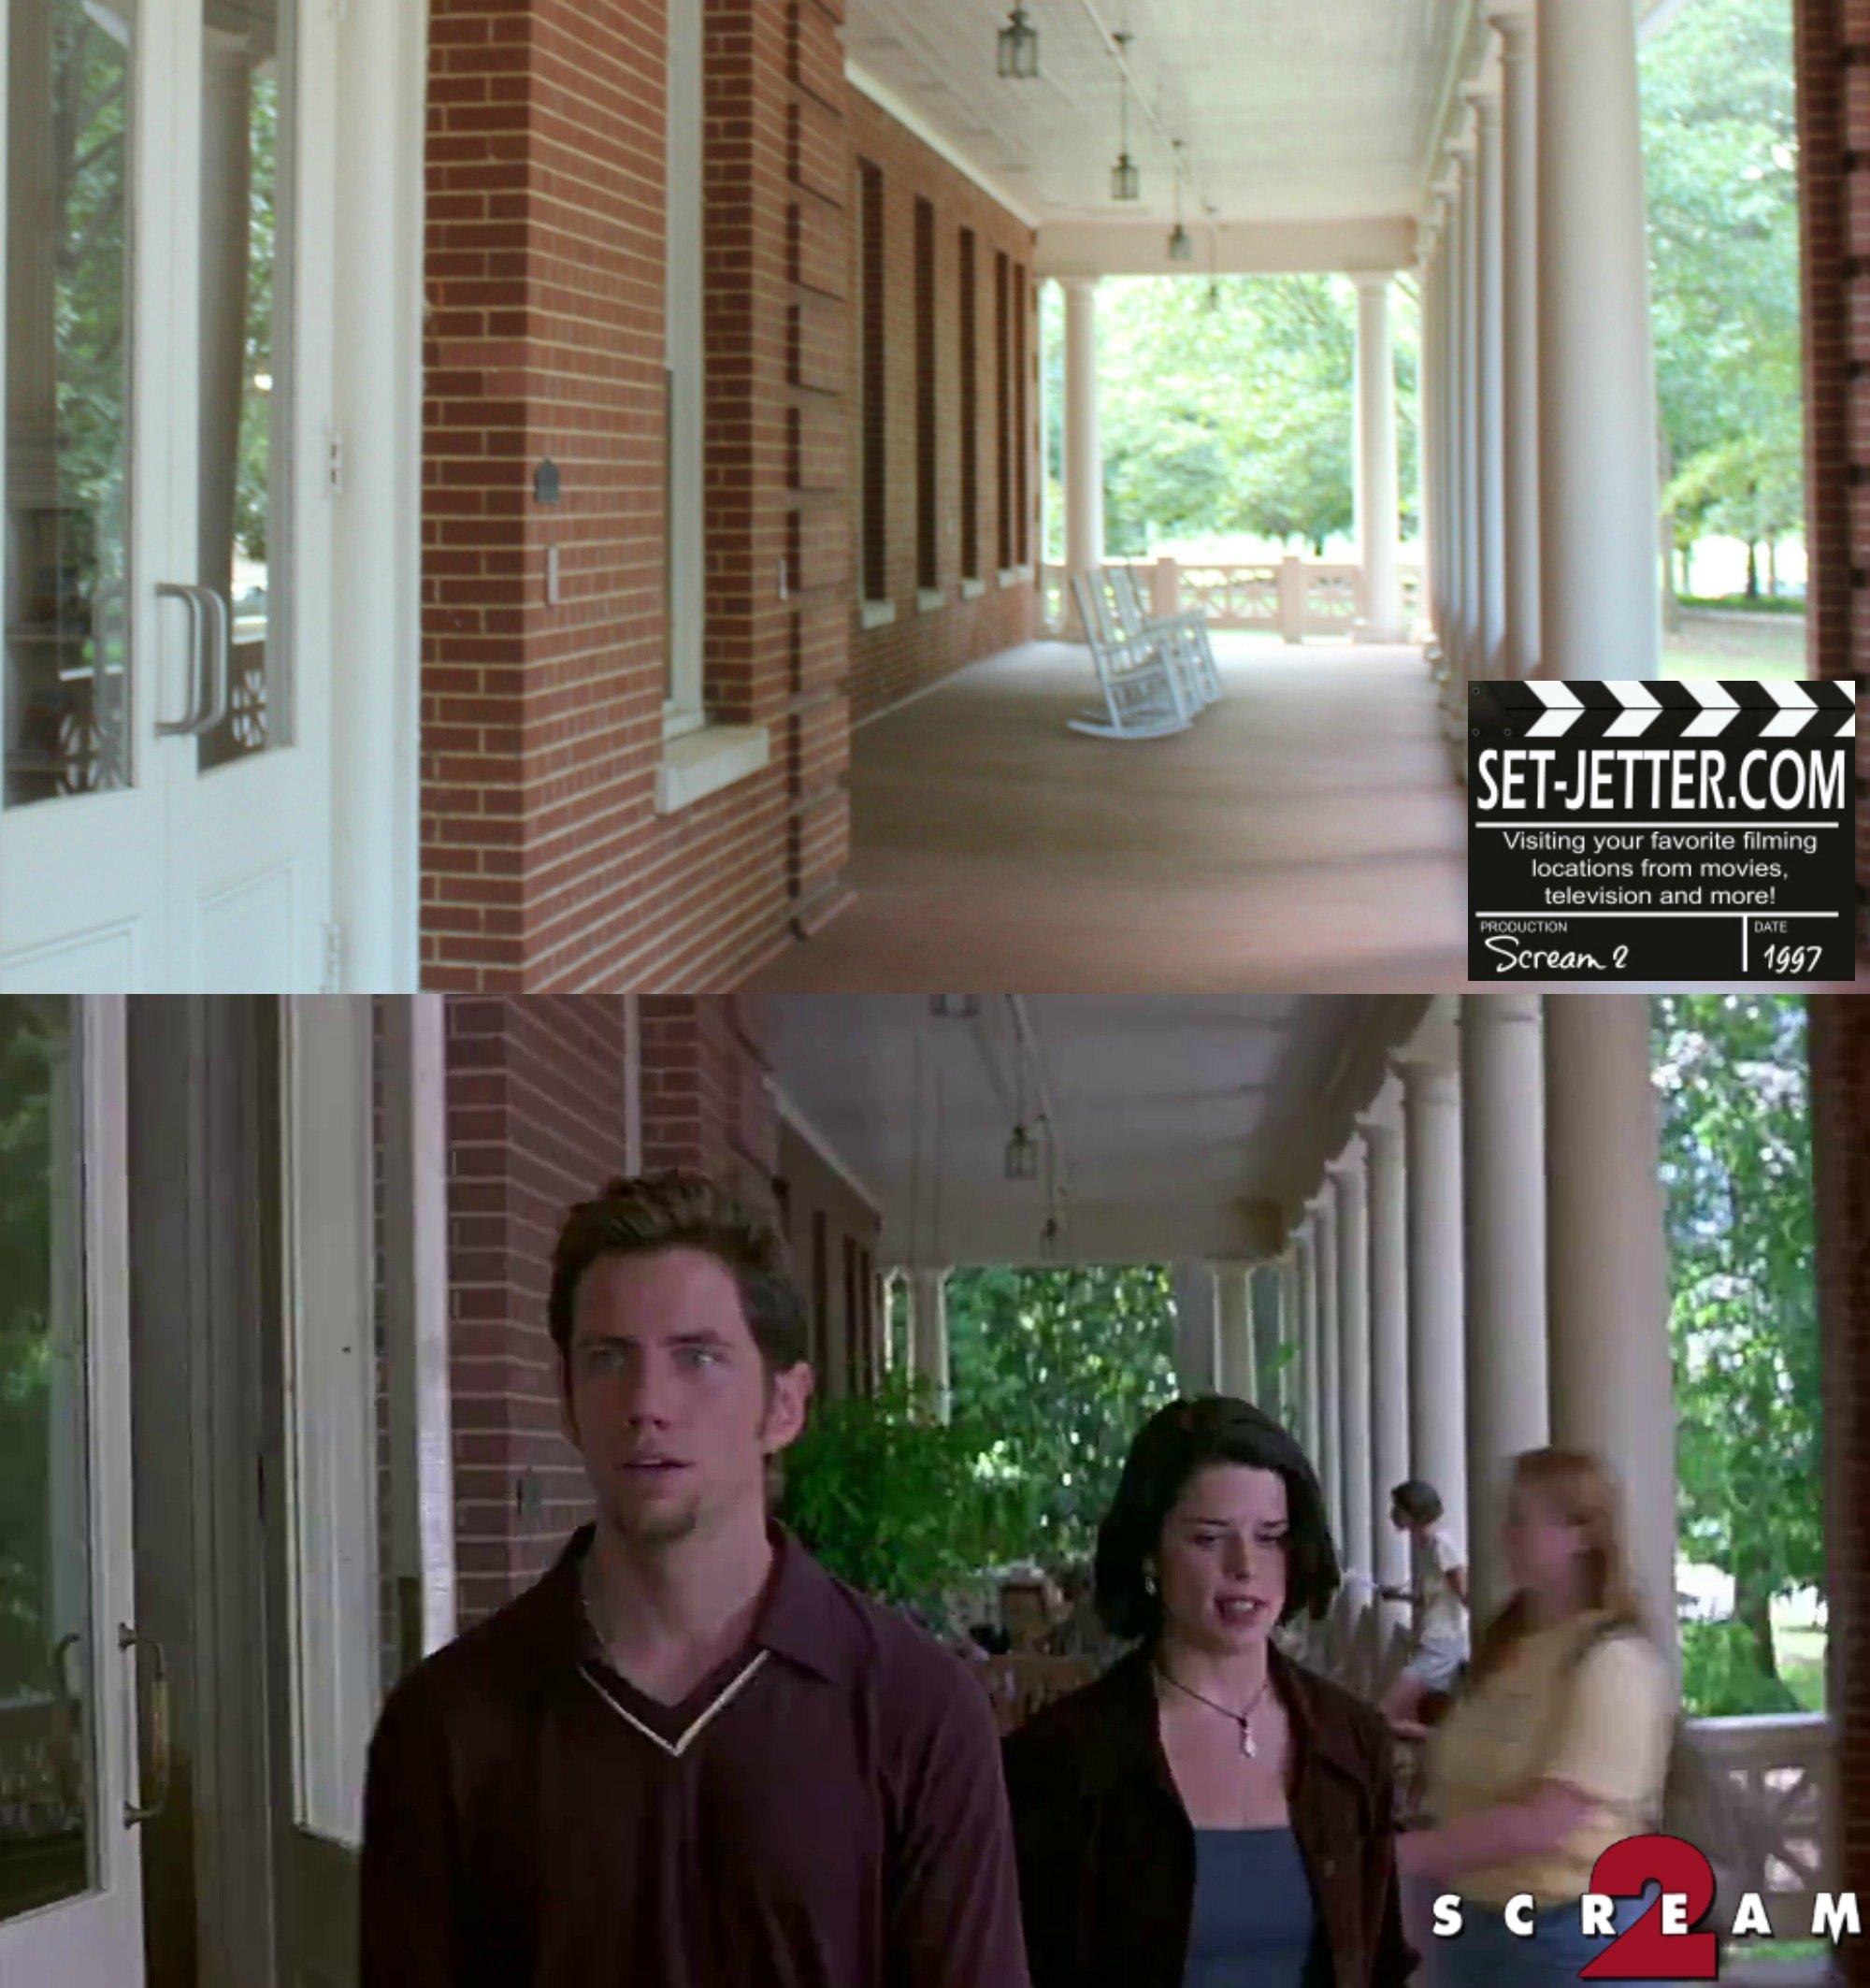 Scream 2 comparison 31.jpg